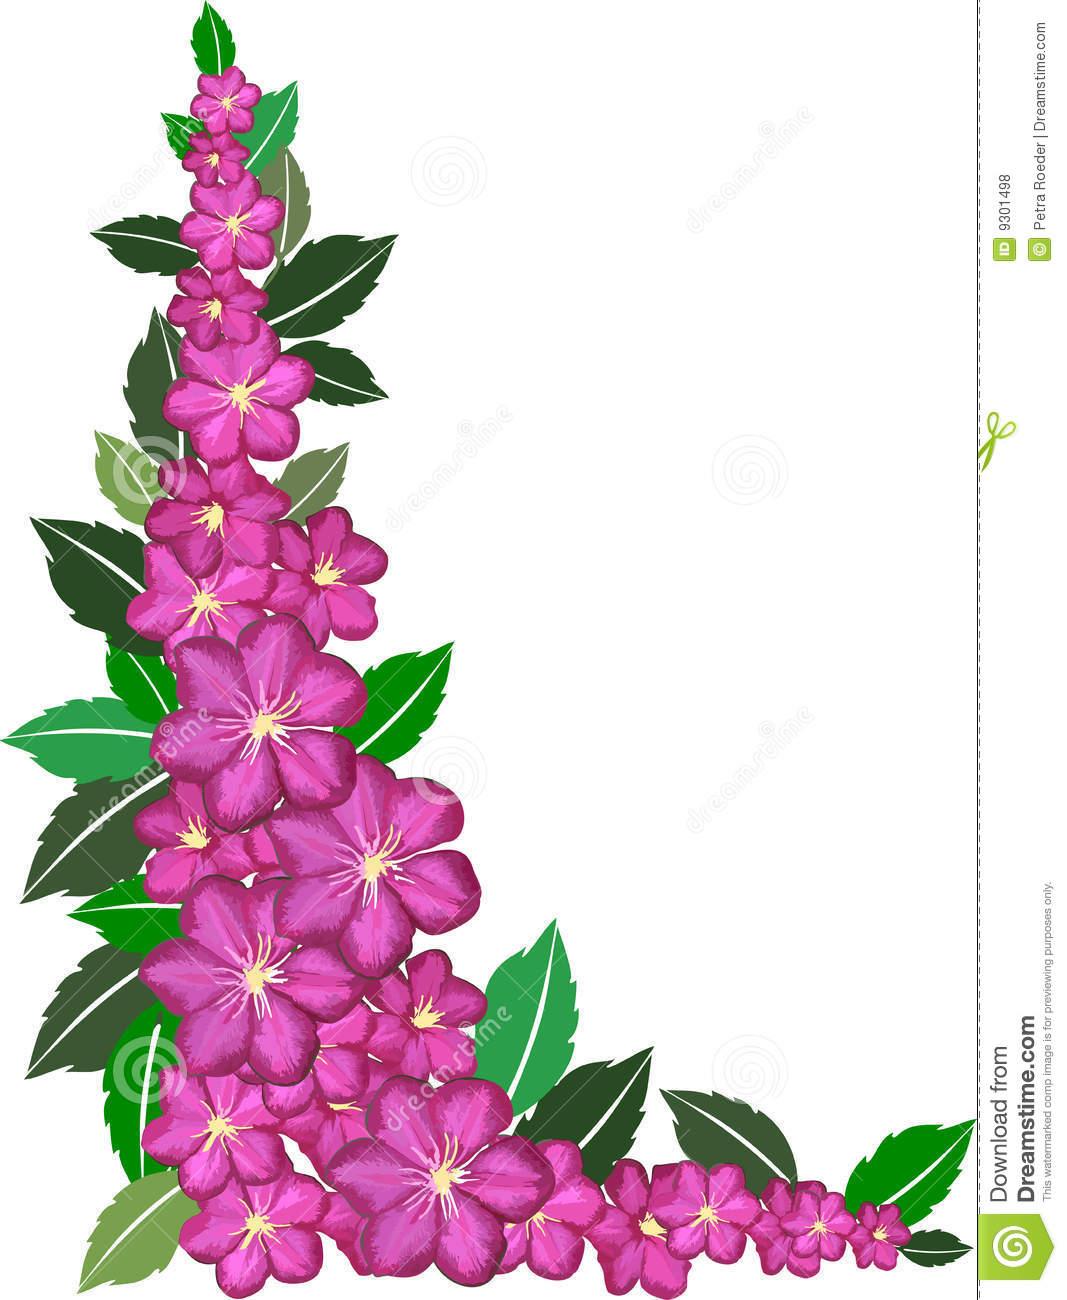 Flower Border Line Clipart Free Download Best Flower Border Line